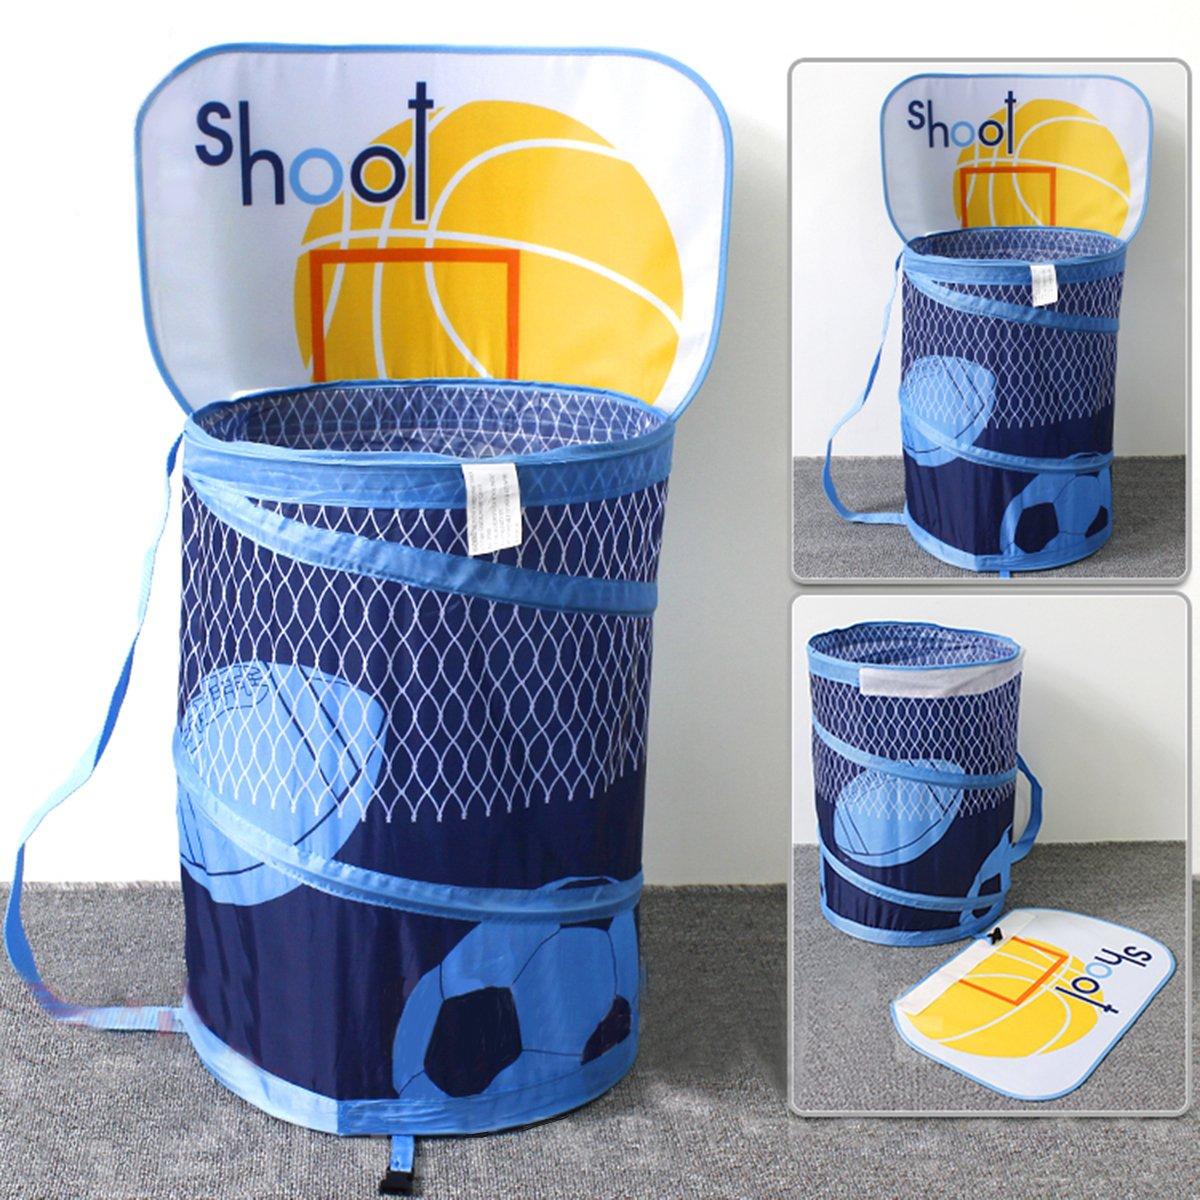 Ao blare 14X19Inch Basketball Hoop Toy Bucket Laundry Basket Clothes Hamper Toys Basket Storage Bucket Folding Cylinder Laundry Basket Toy Box Organizer Storage Bag